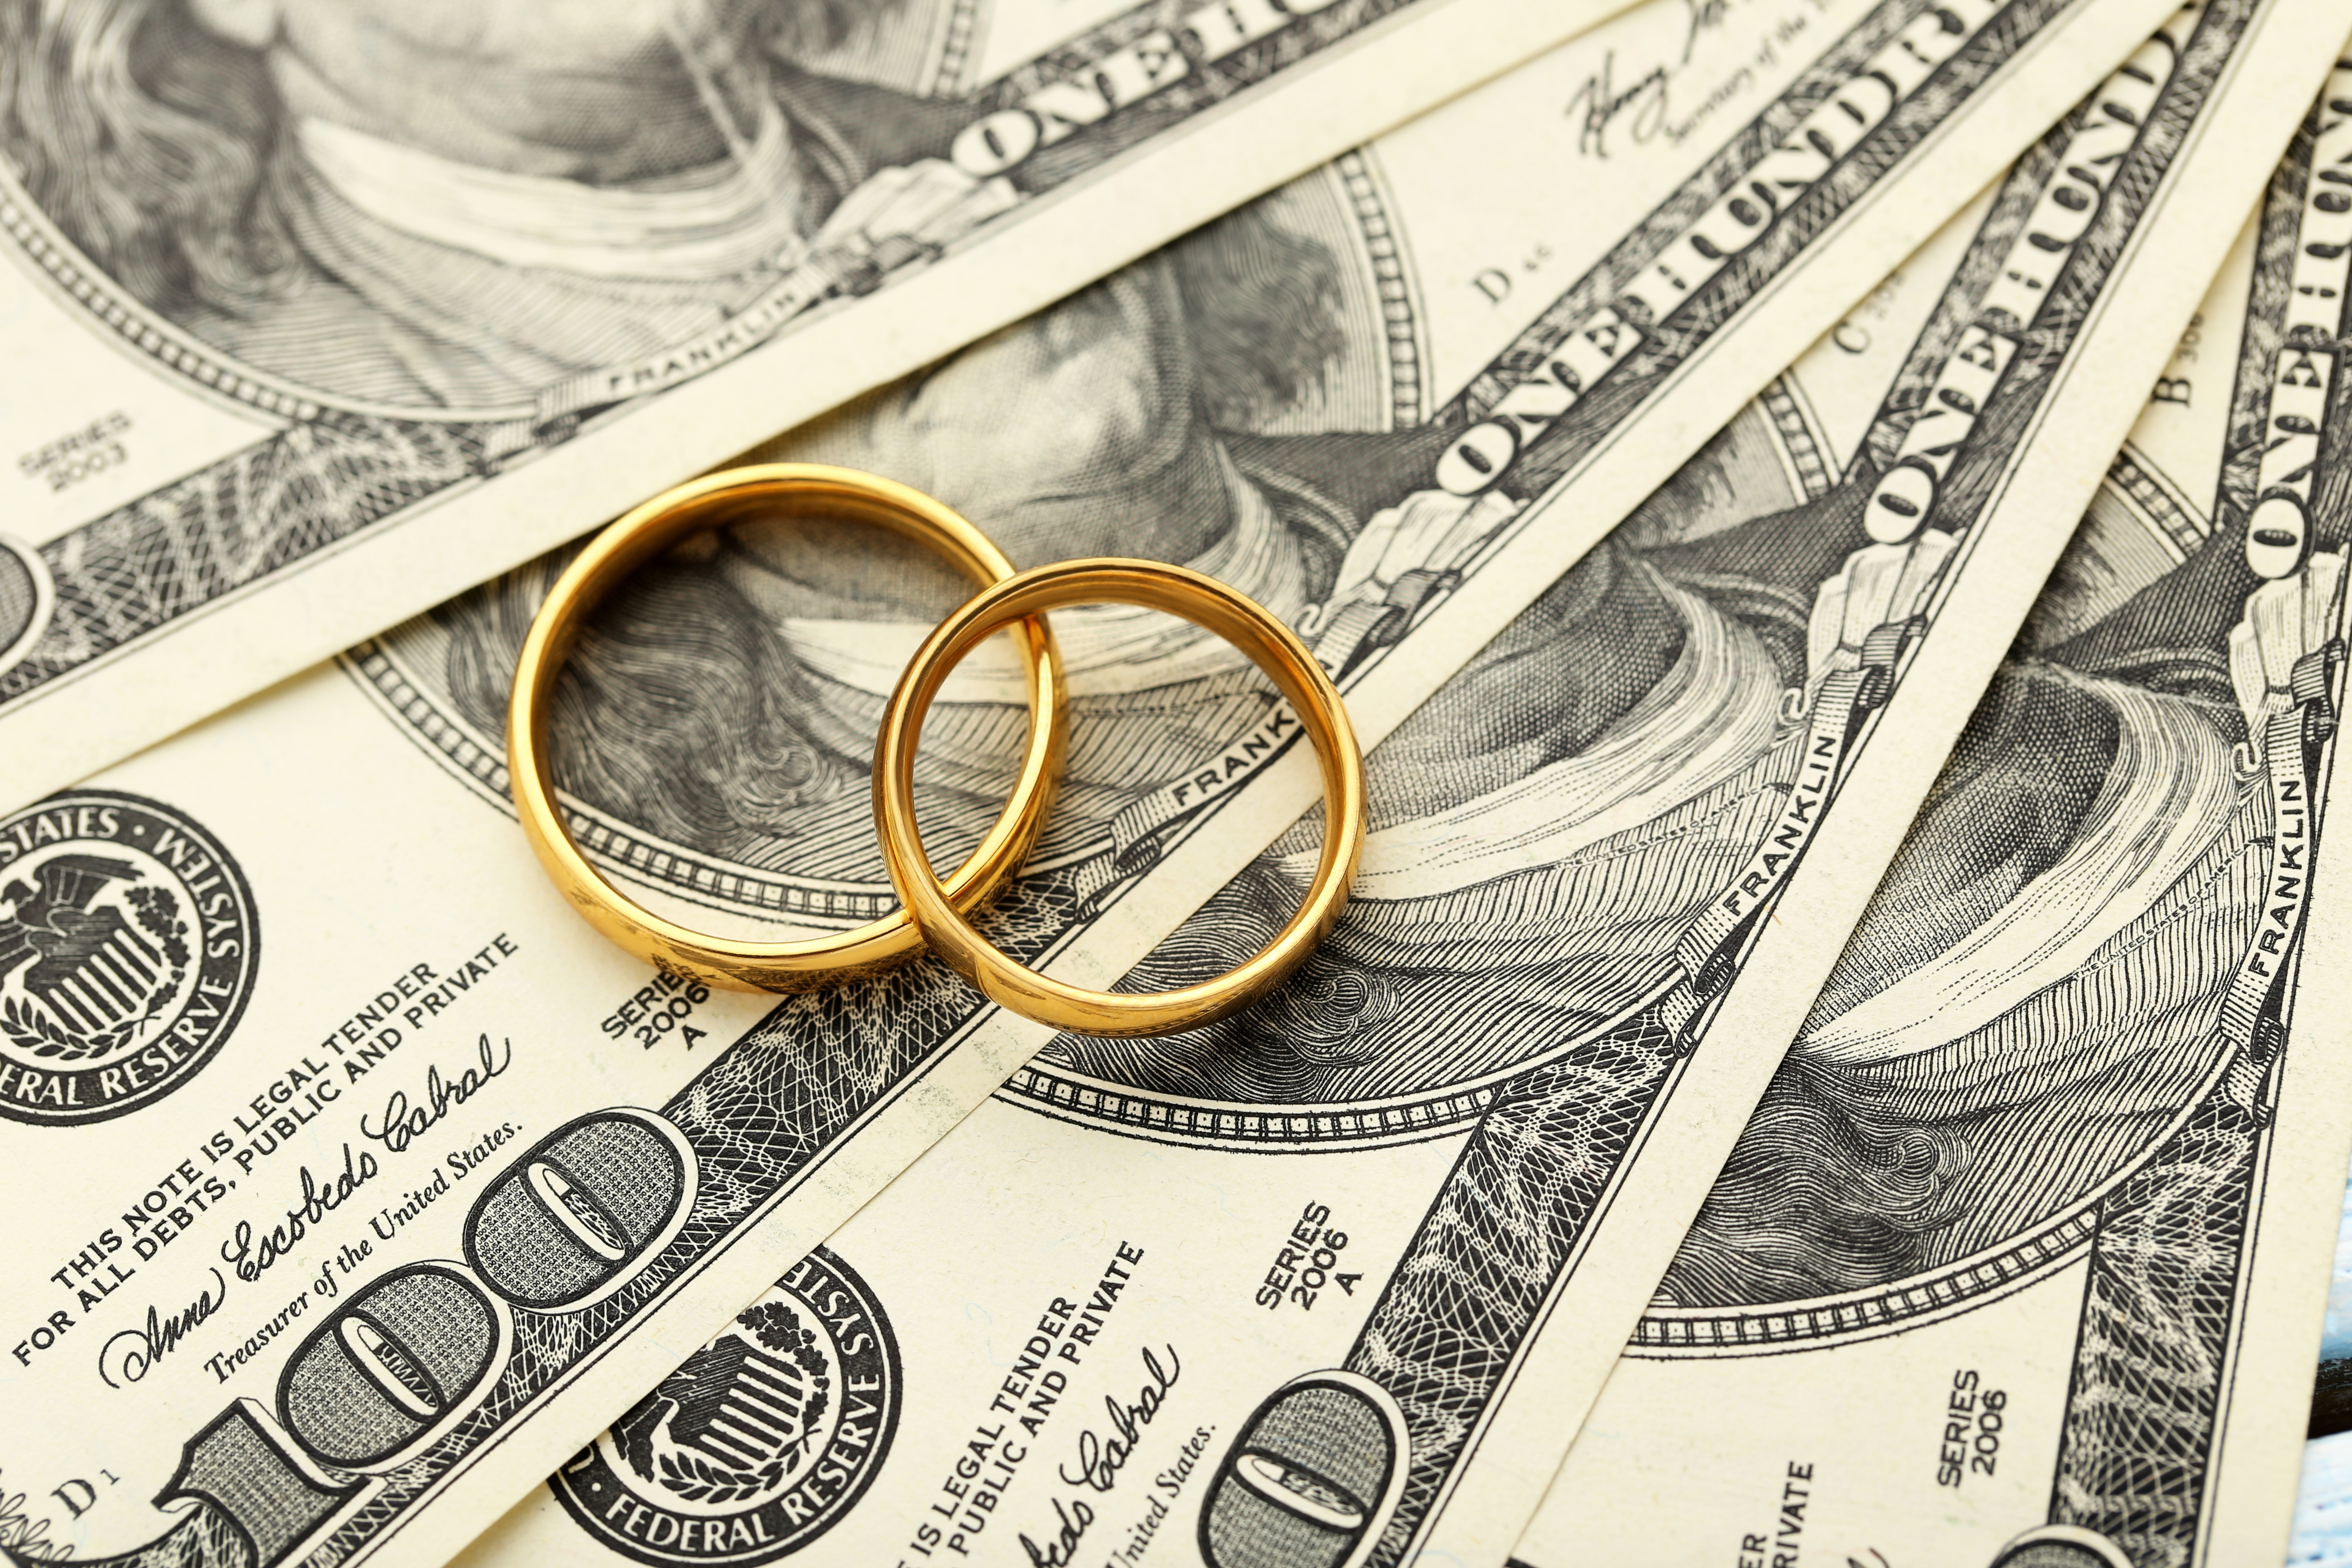 wedding rings on top of cash